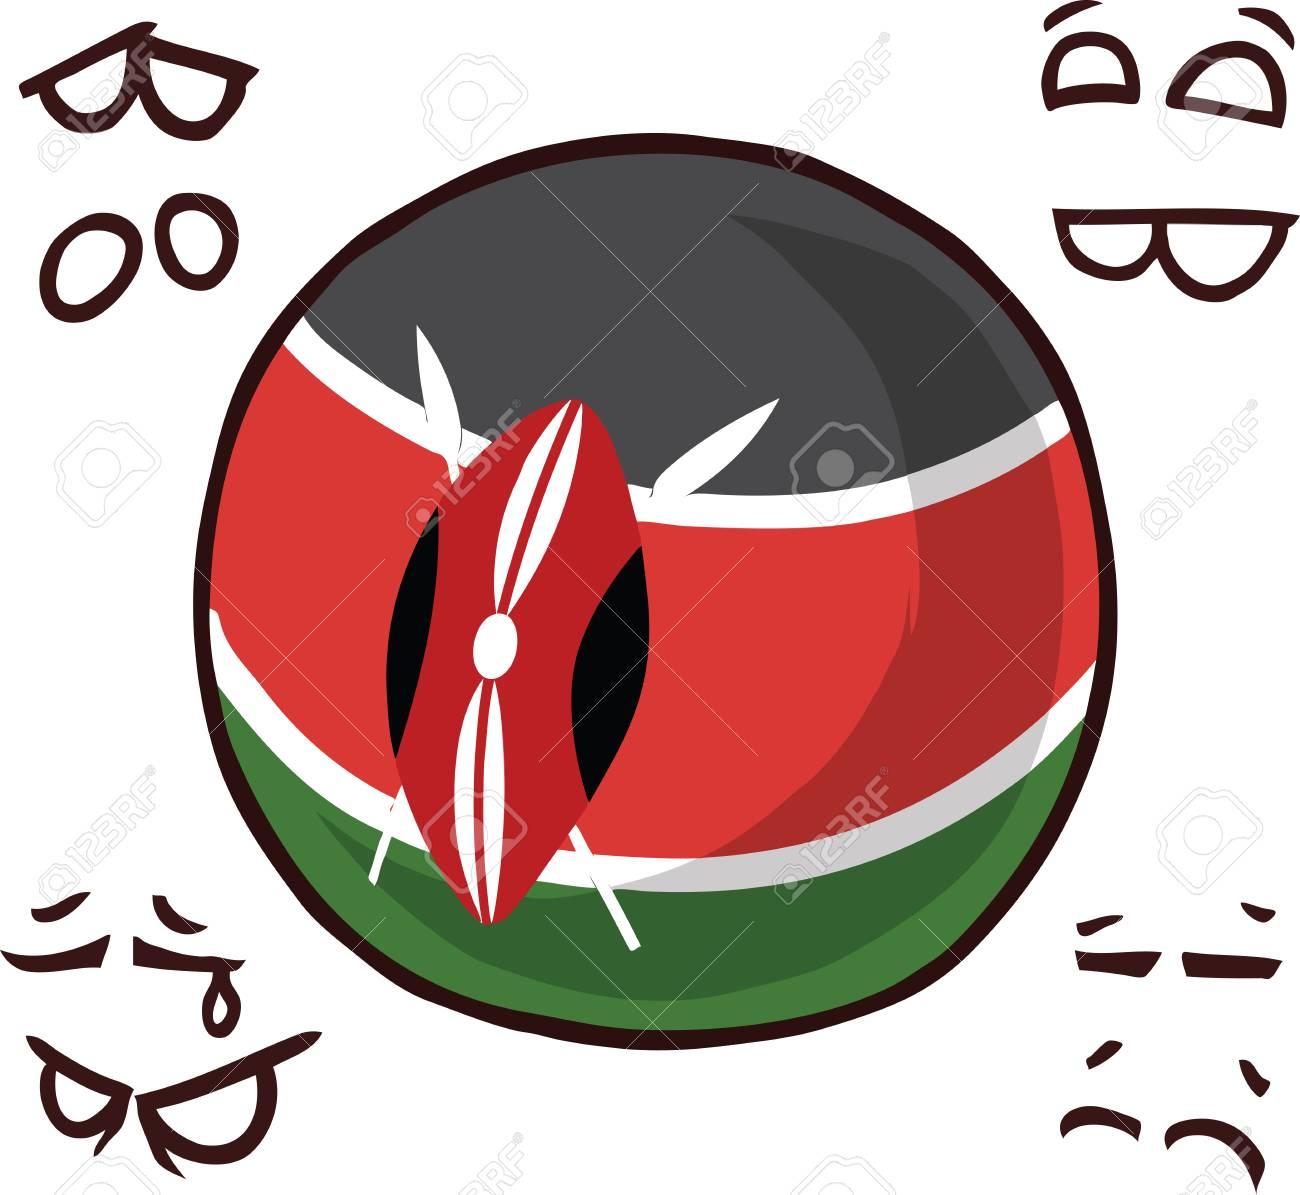 kenya country ball - 110723160